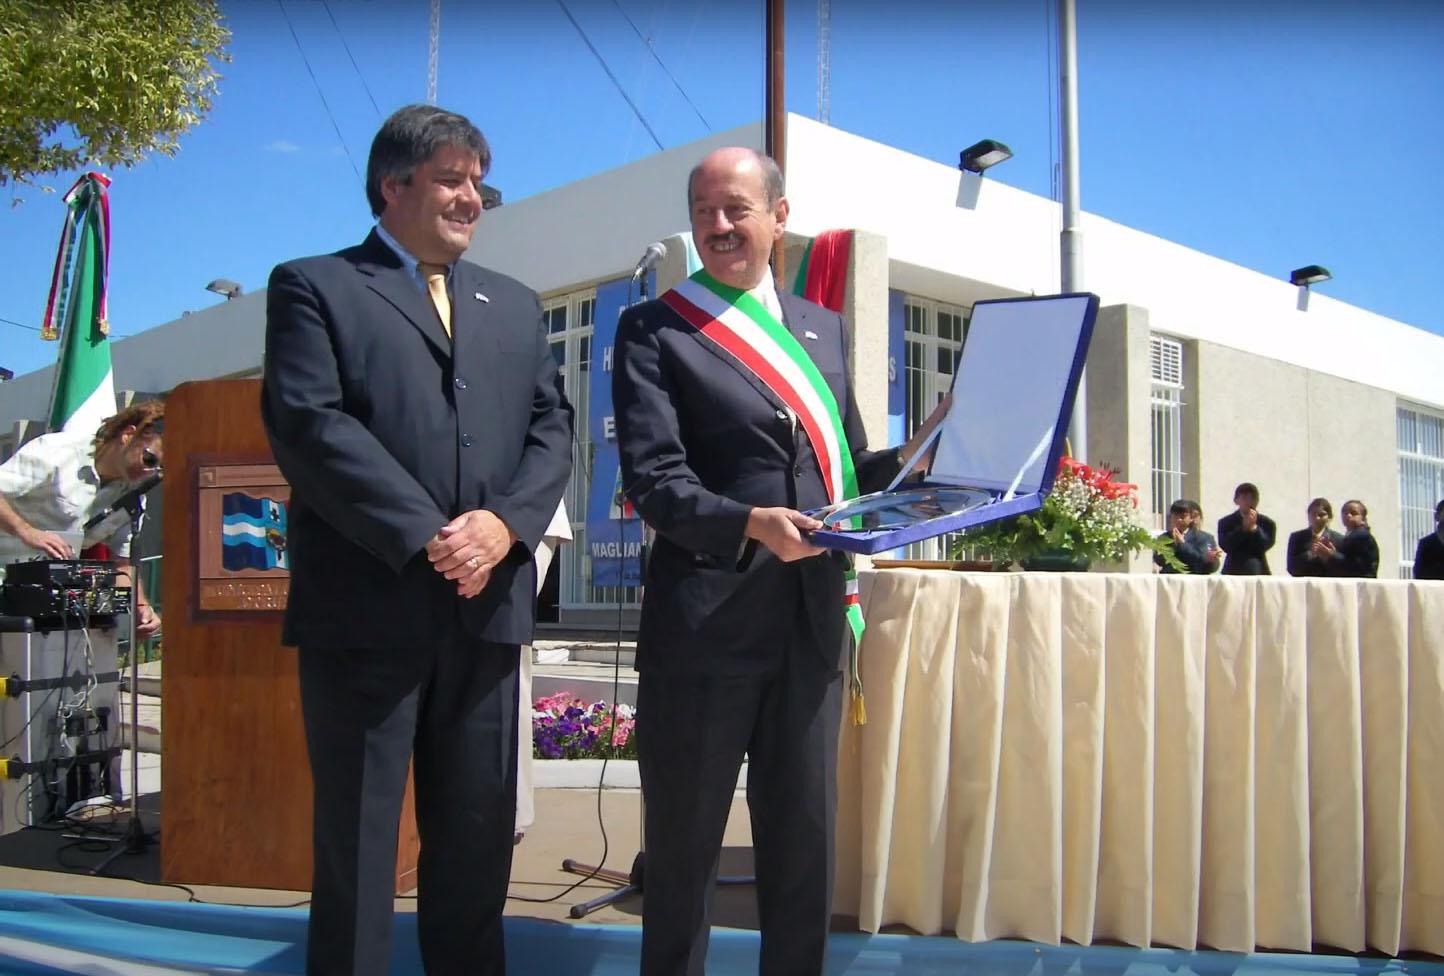 Hermanamiento Etruria-Magliano Alpi